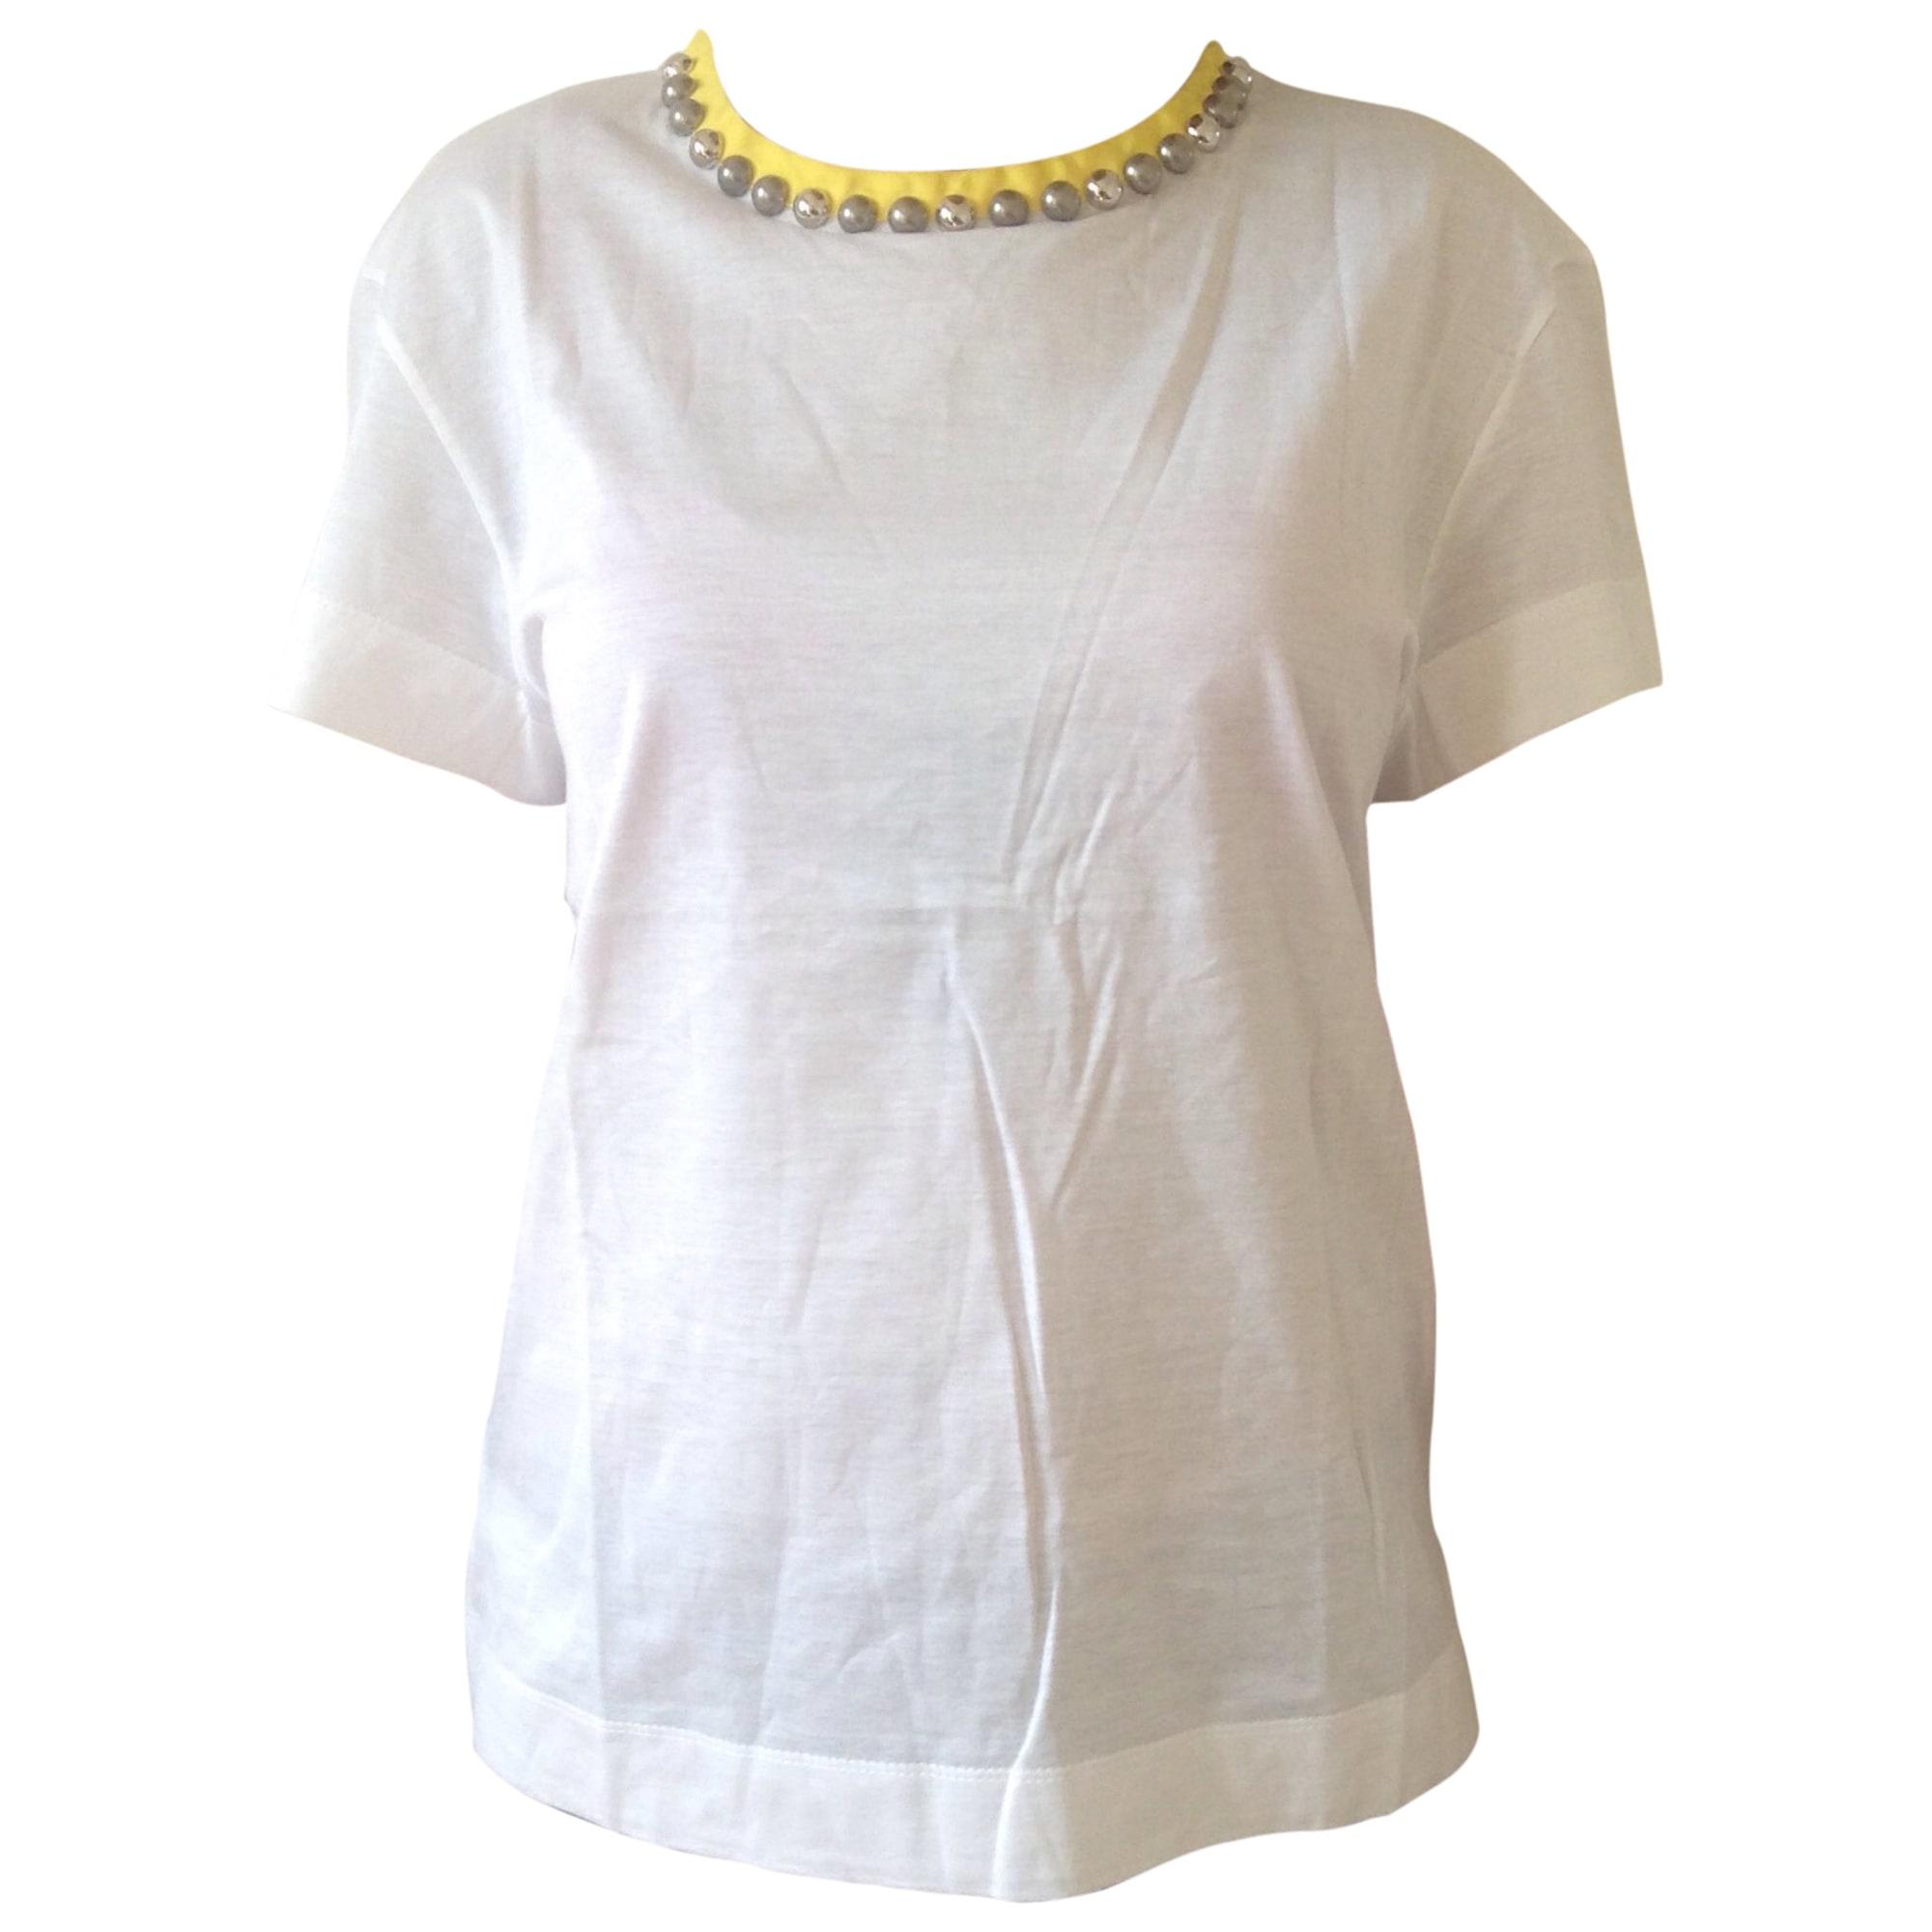 Top, tee-shirt LOUIS VUITTON Blanc, blanc cassé, écru